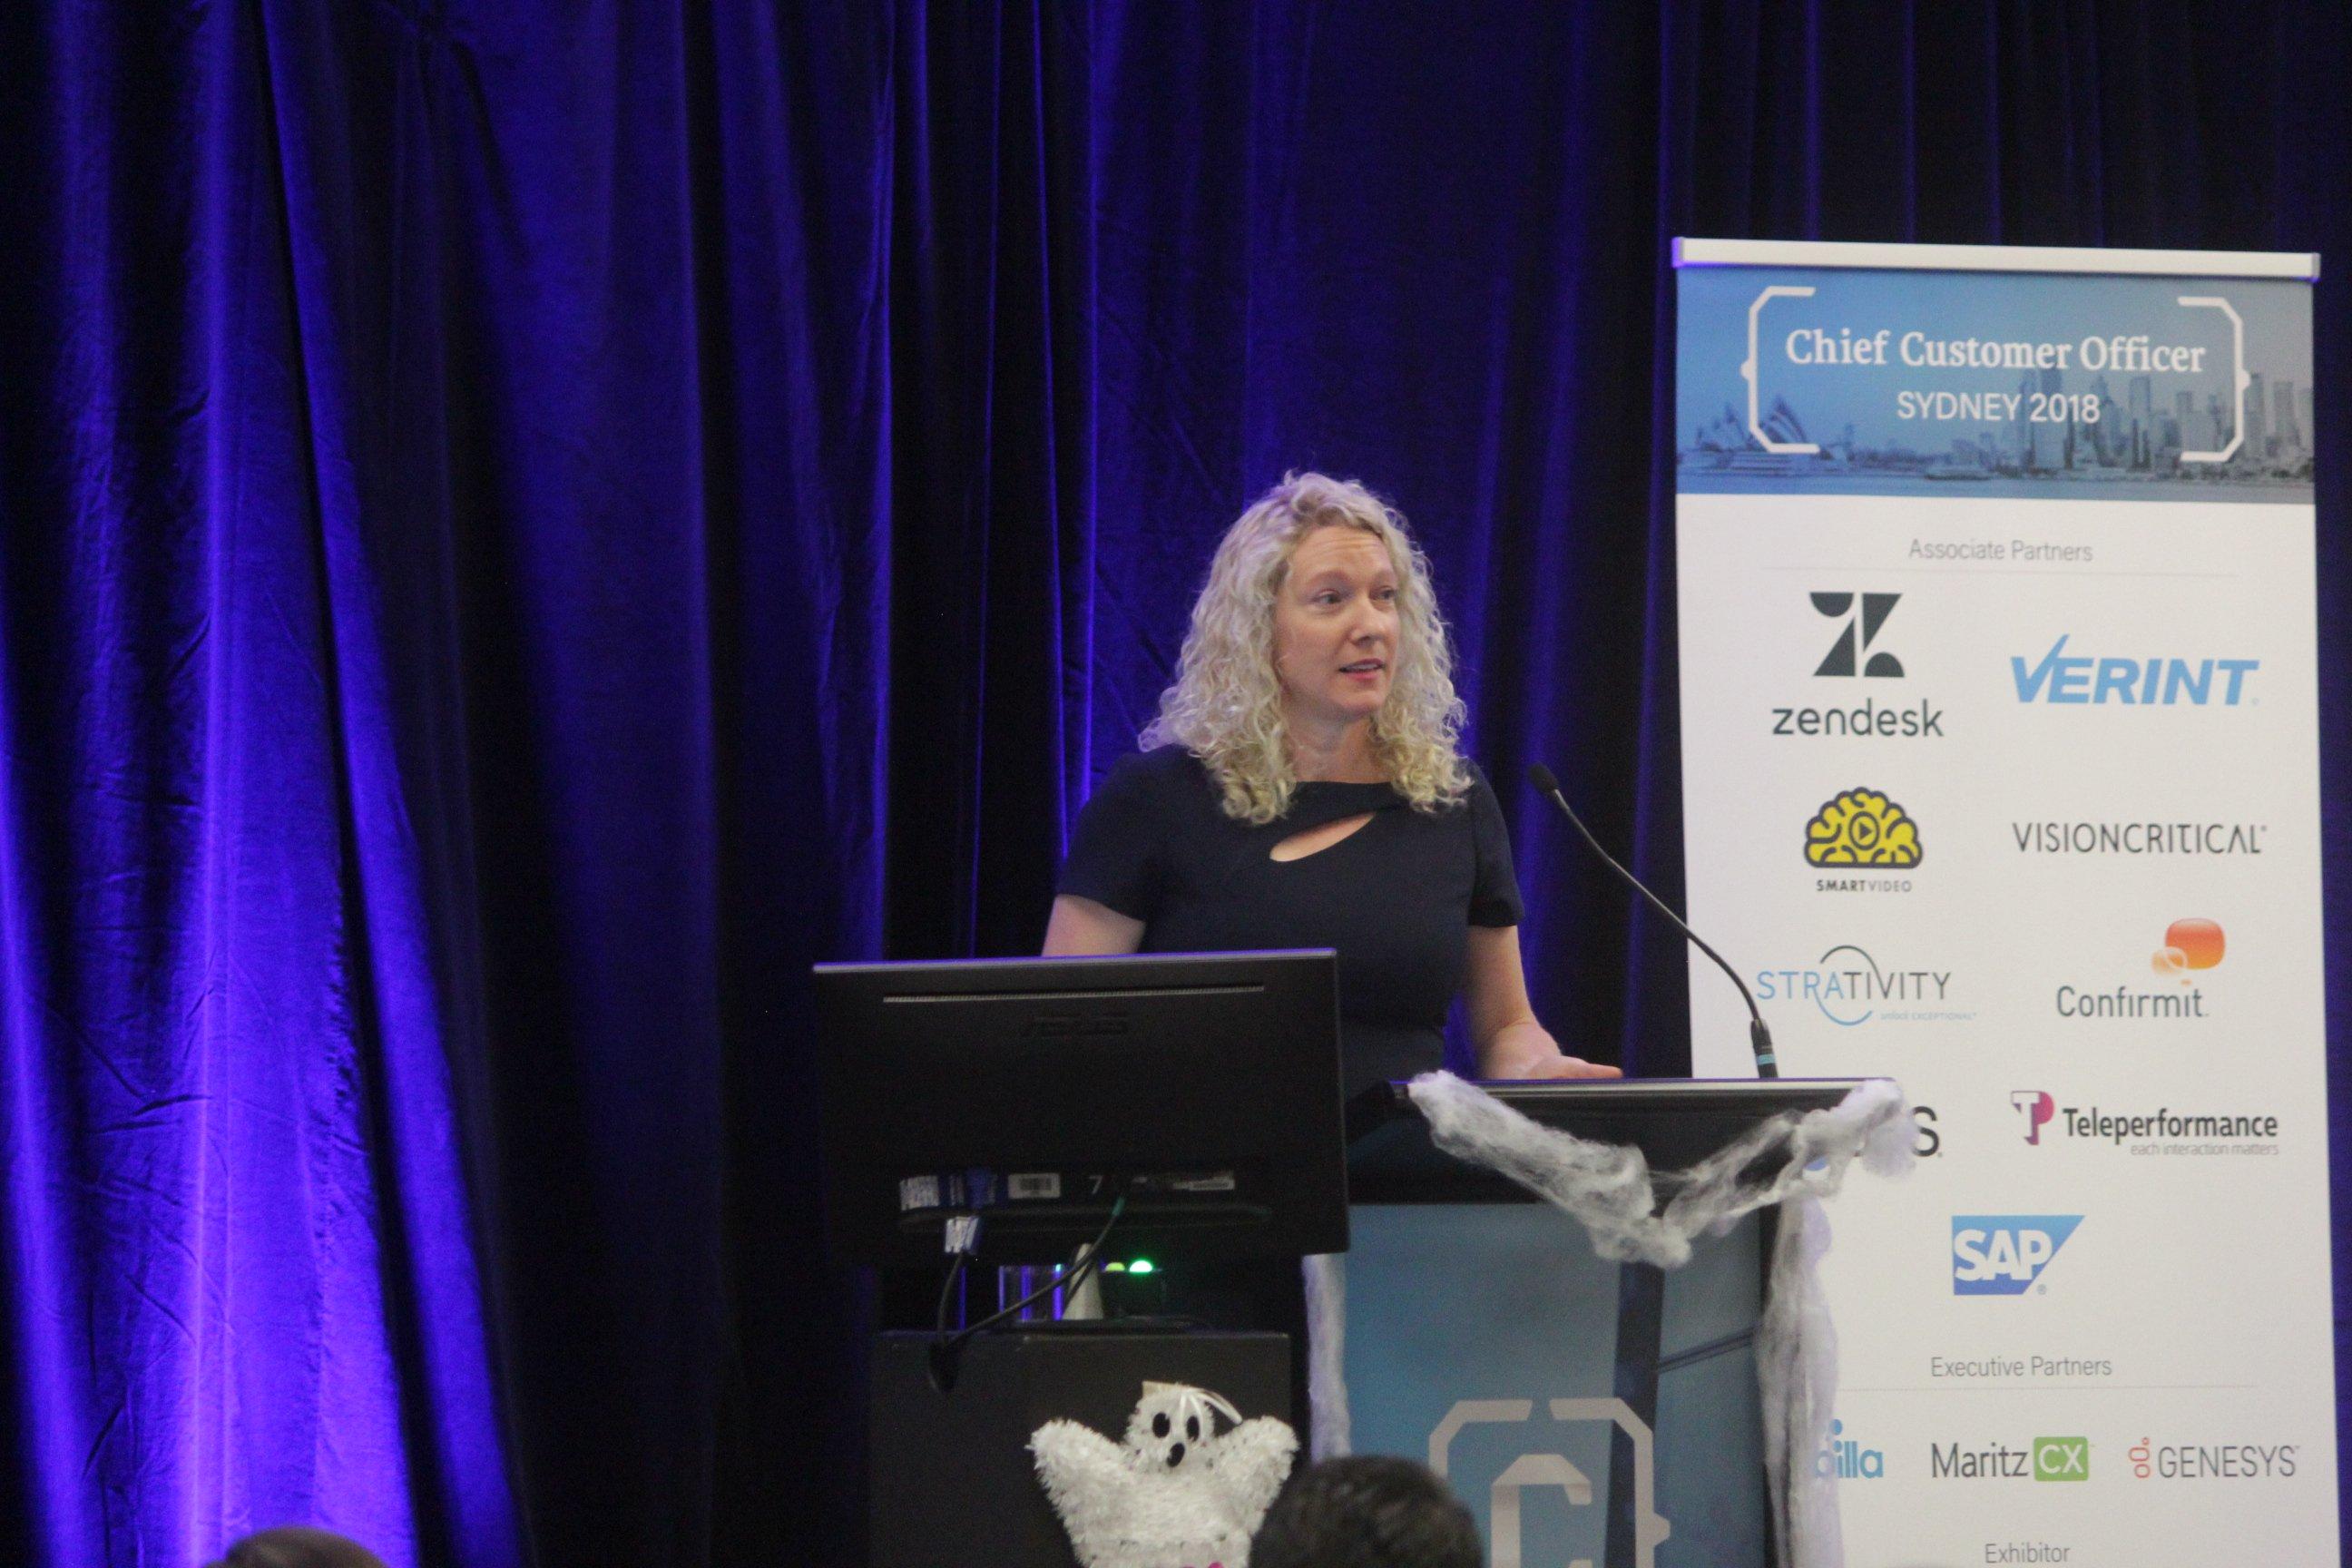 IMG_2015 CCO Sydney 2018